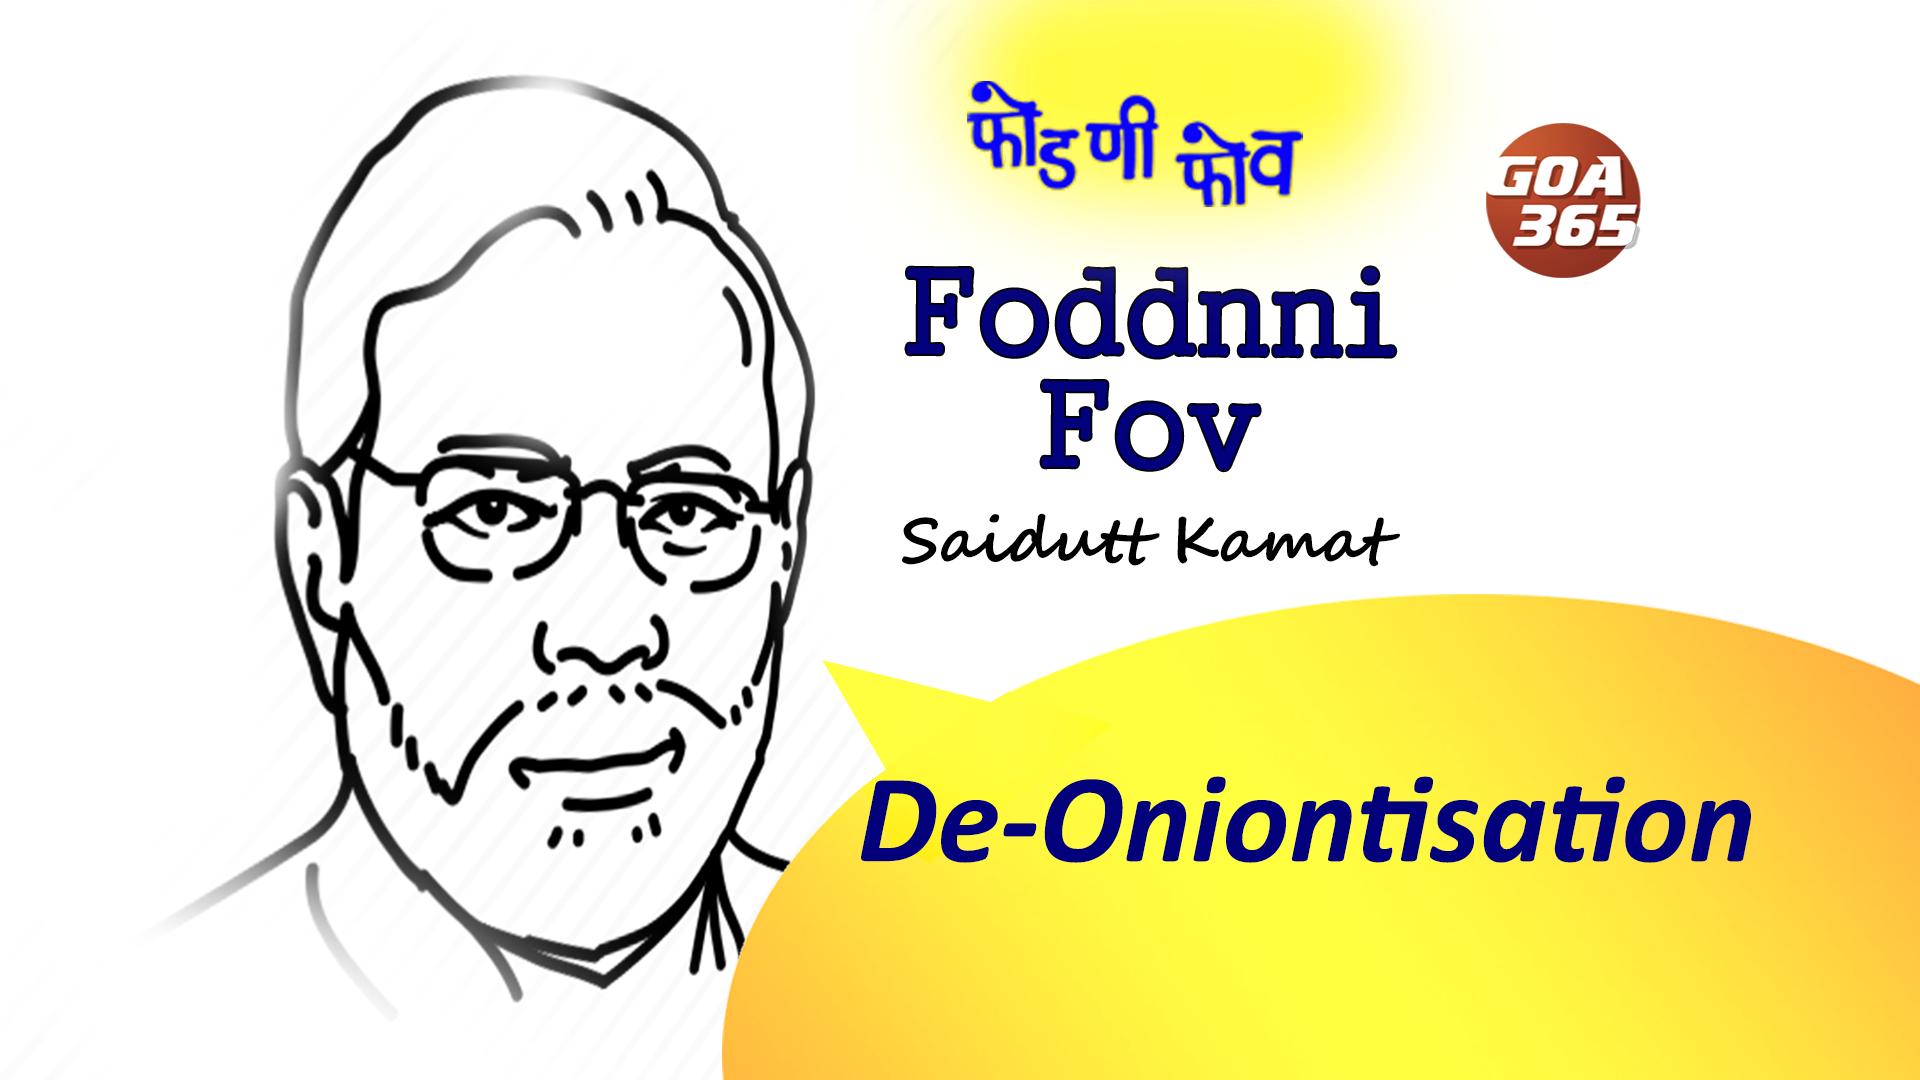 #FODDNNI_FOV : De-Oniontisation